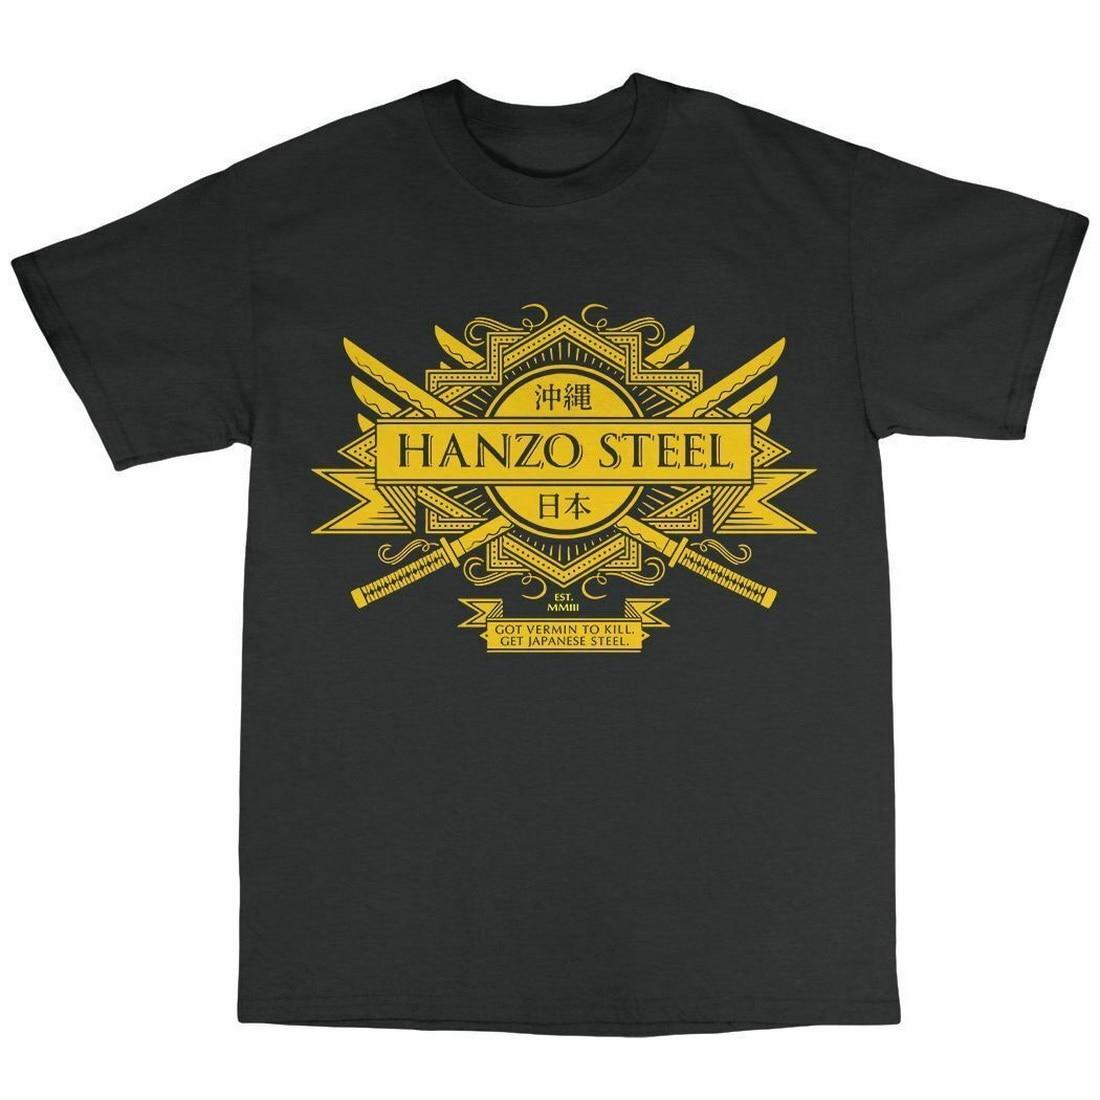 hanzo-steel-tops-tee-t-shirt-100-cotton-kill-bill-inspired-quentin-tarantino-sword-t-shirt-custom-graphic